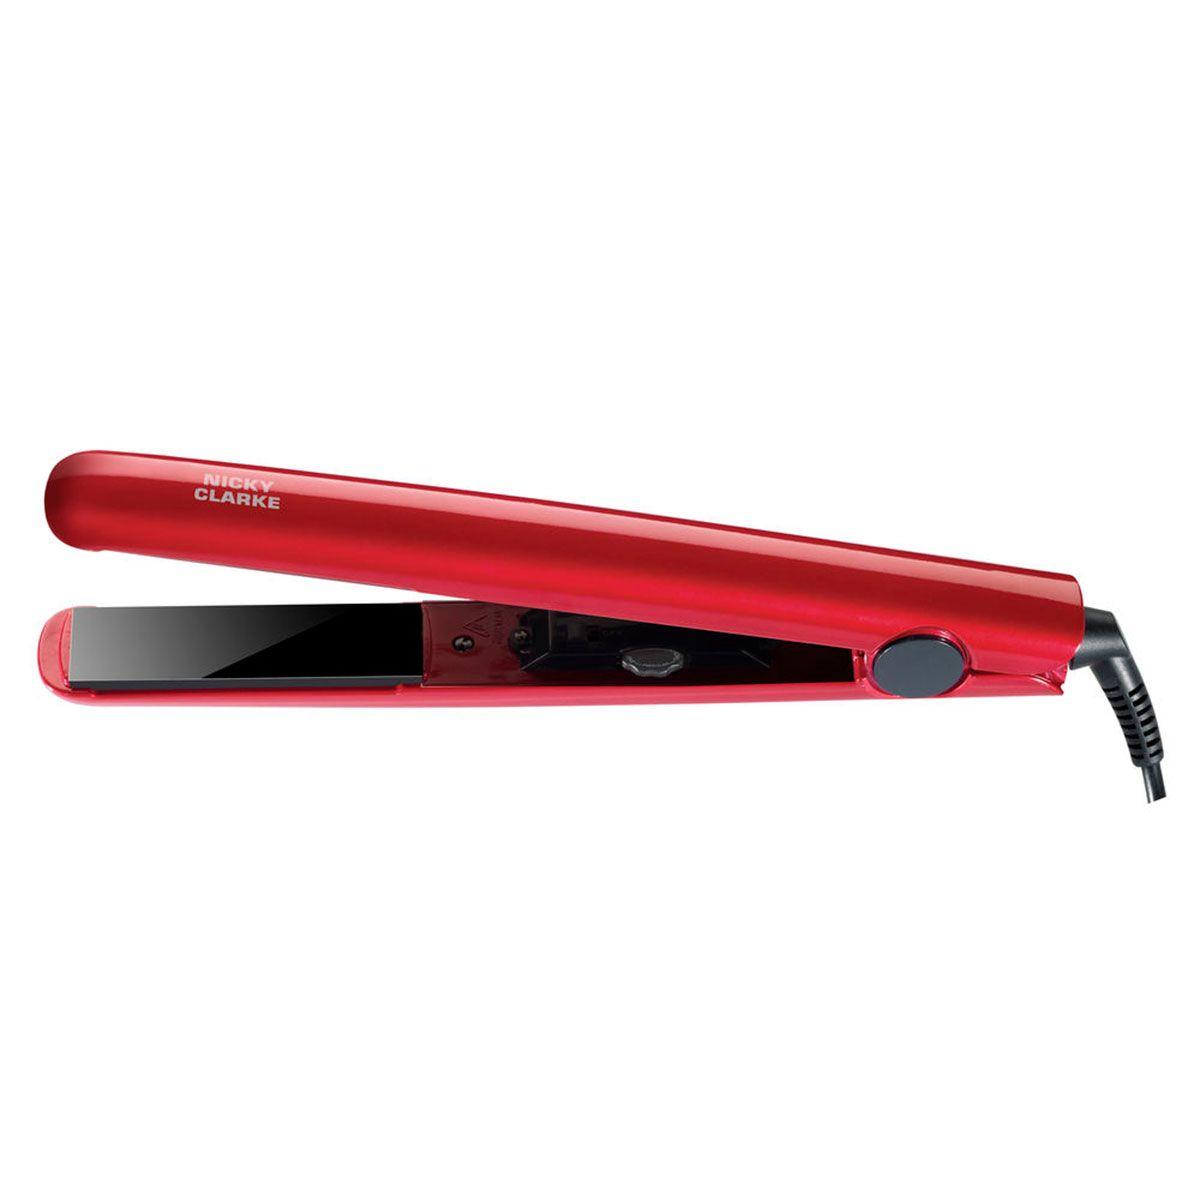 Nicky Clarke DesiRED Hair Straightener review